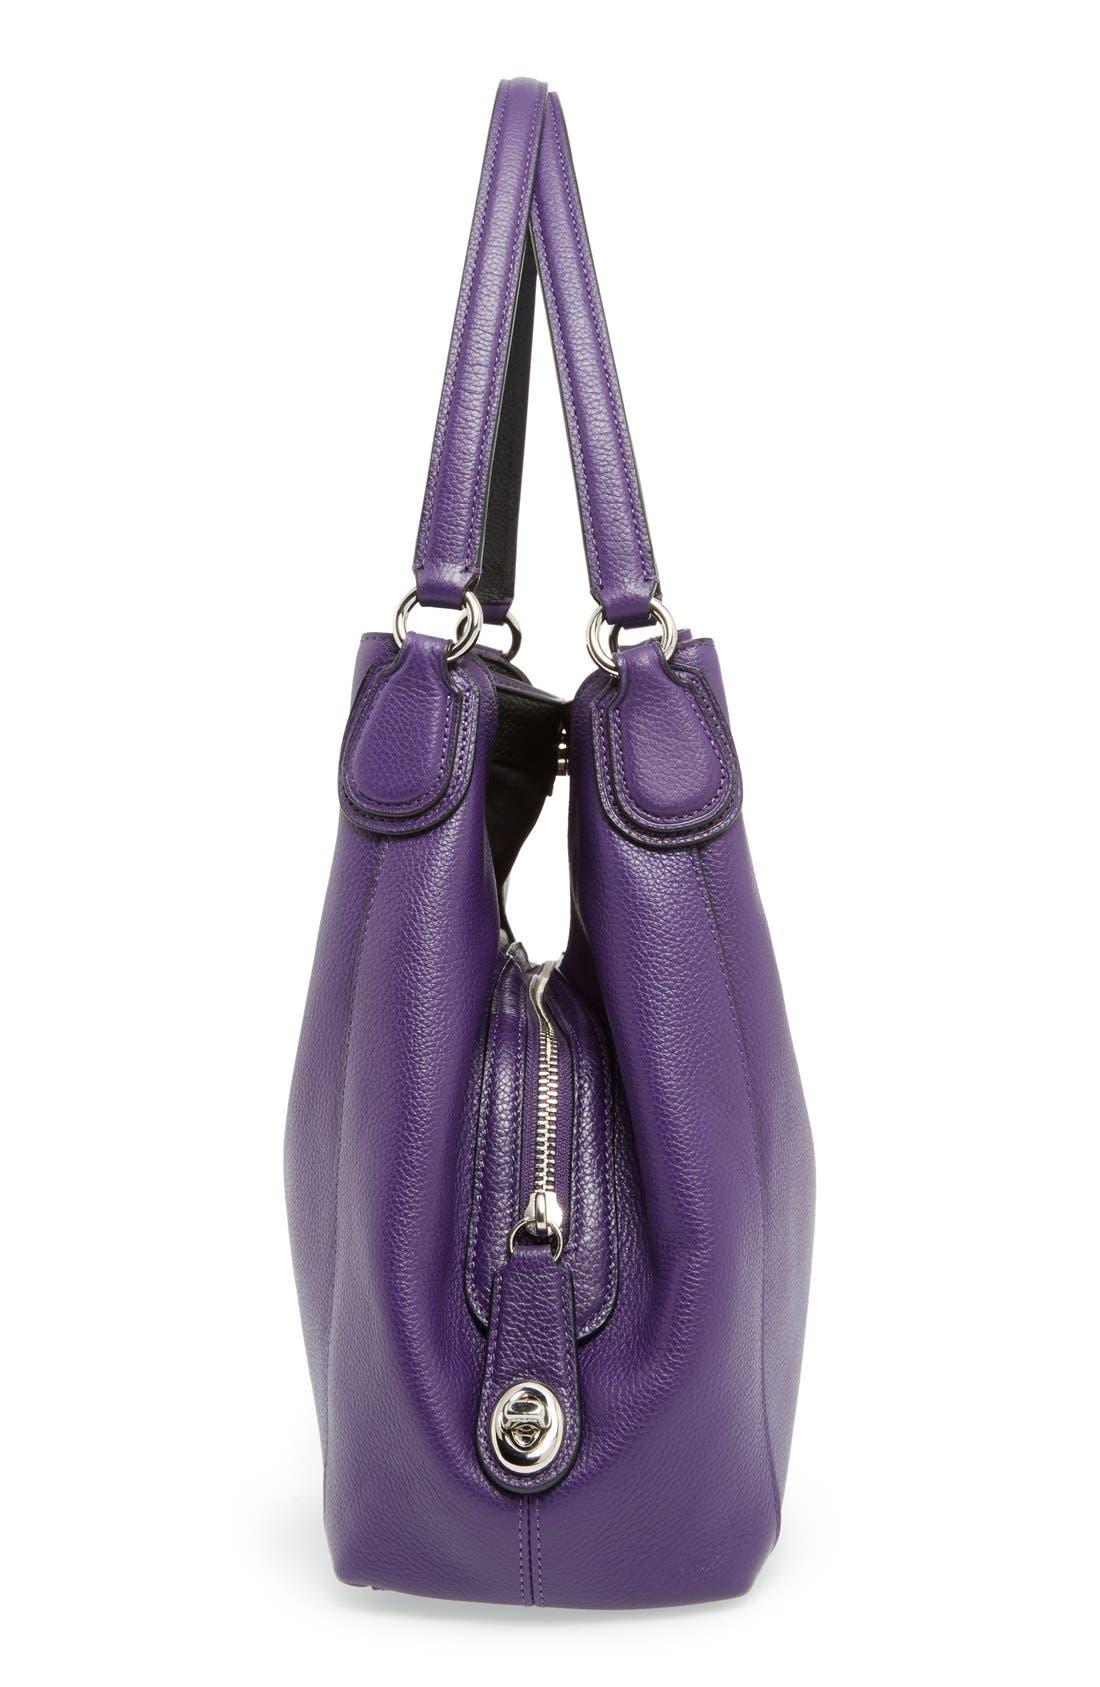 COACH,                             'Edie 31' Pebbled Leather Shoulder Bag,                             Alternate thumbnail 5, color,                             500